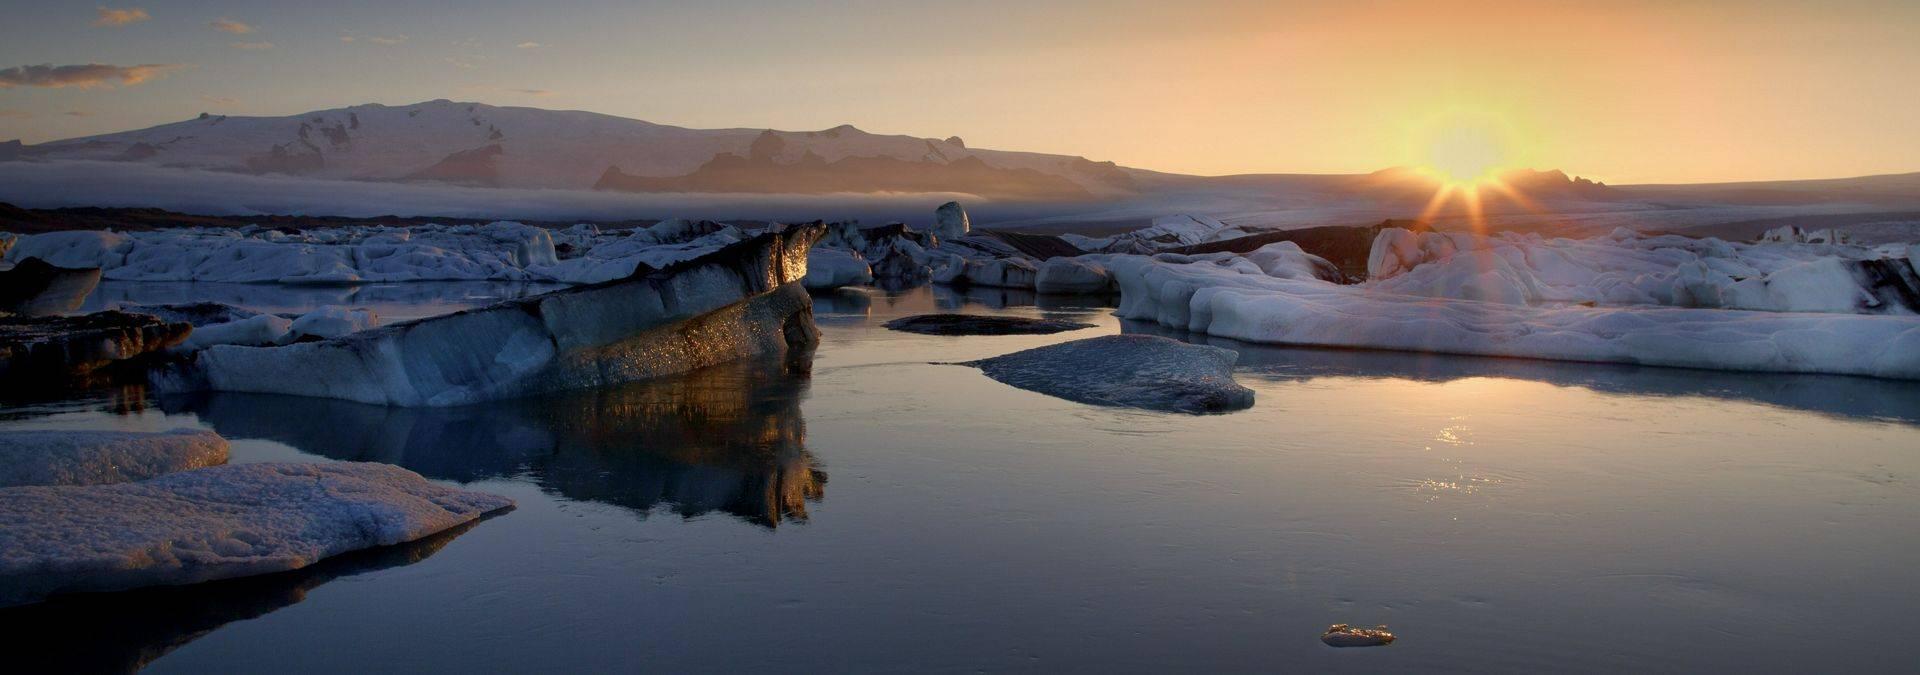 visit_iceland-d42c25d6f41b3f5c.jpg